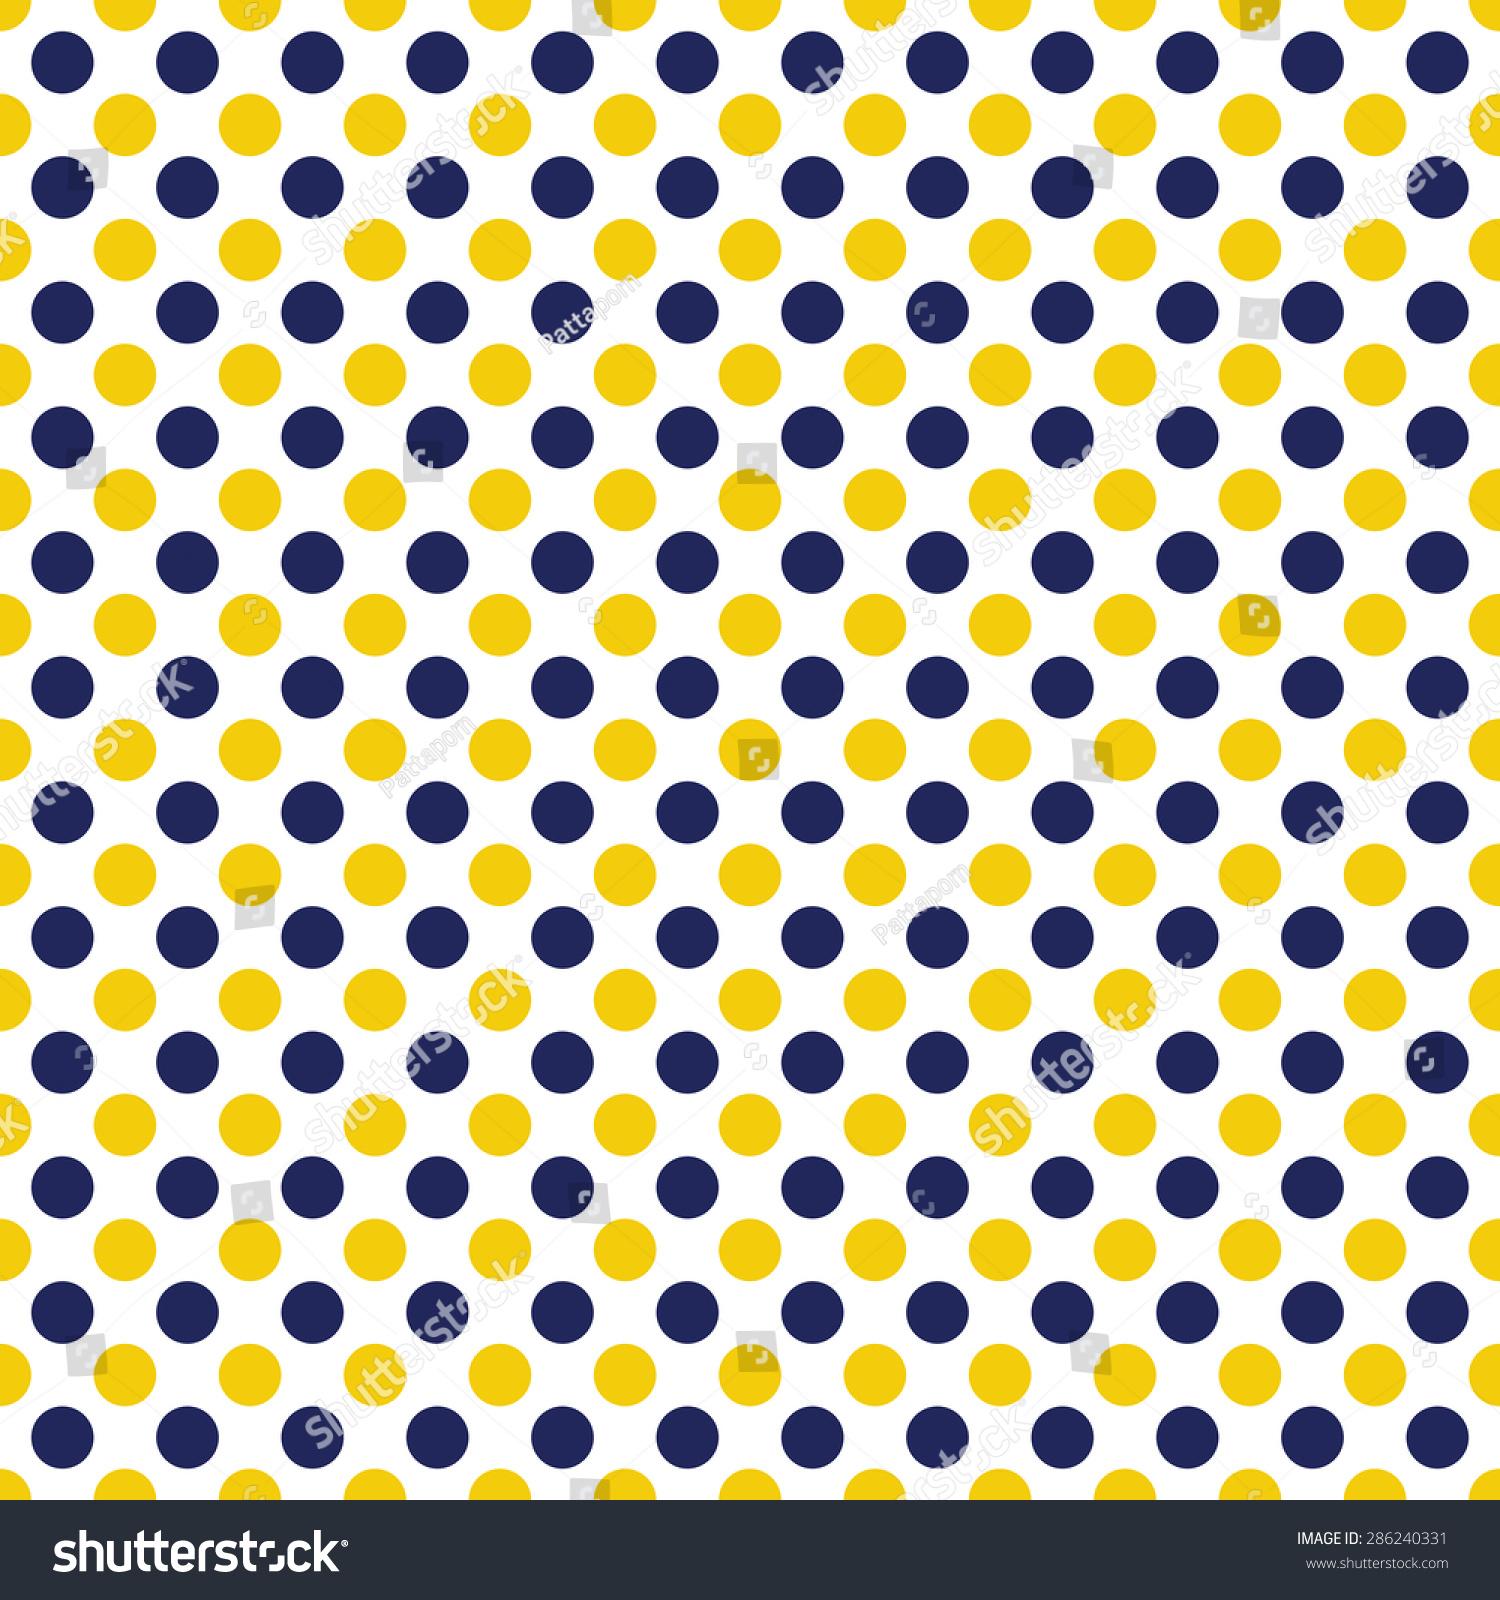 pix Blue Yellow Polka Dots https www shutterstock com image illustration yellow blue white colors polka dots 286240331